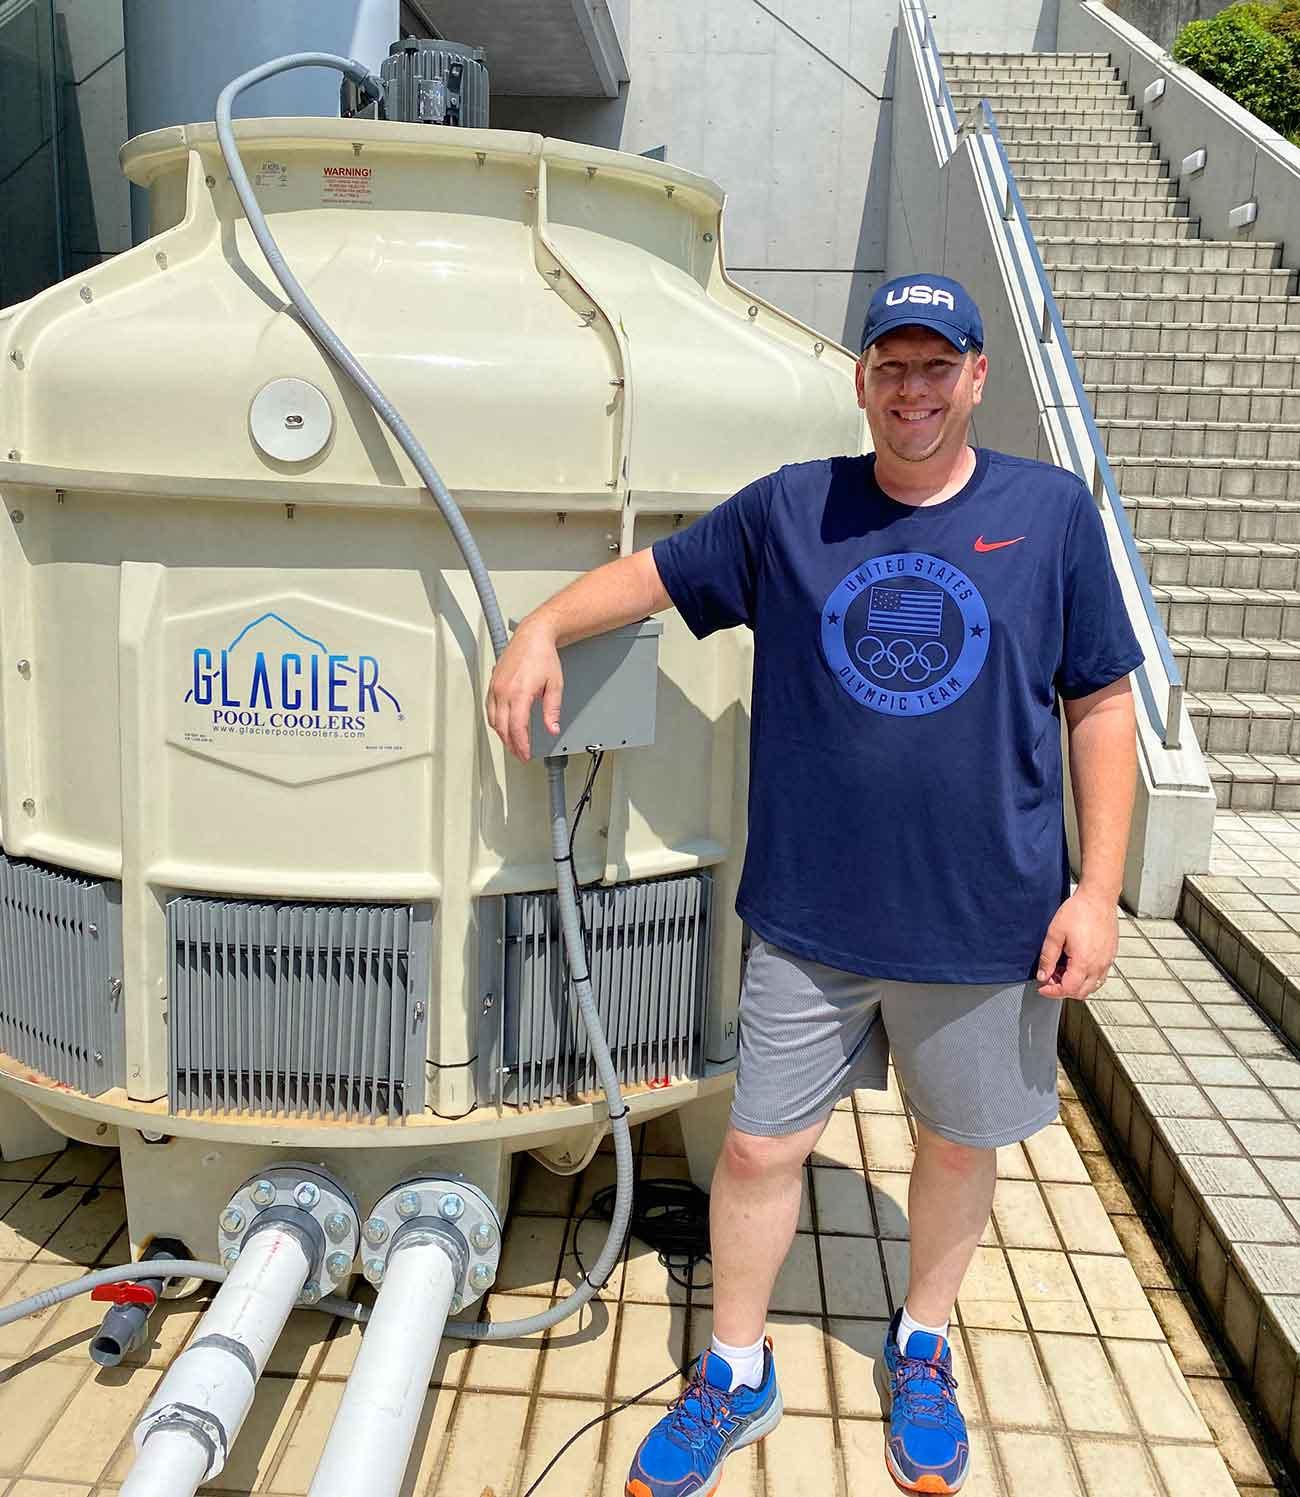 Glacier Pool Coolers - Olympics in Tokyo